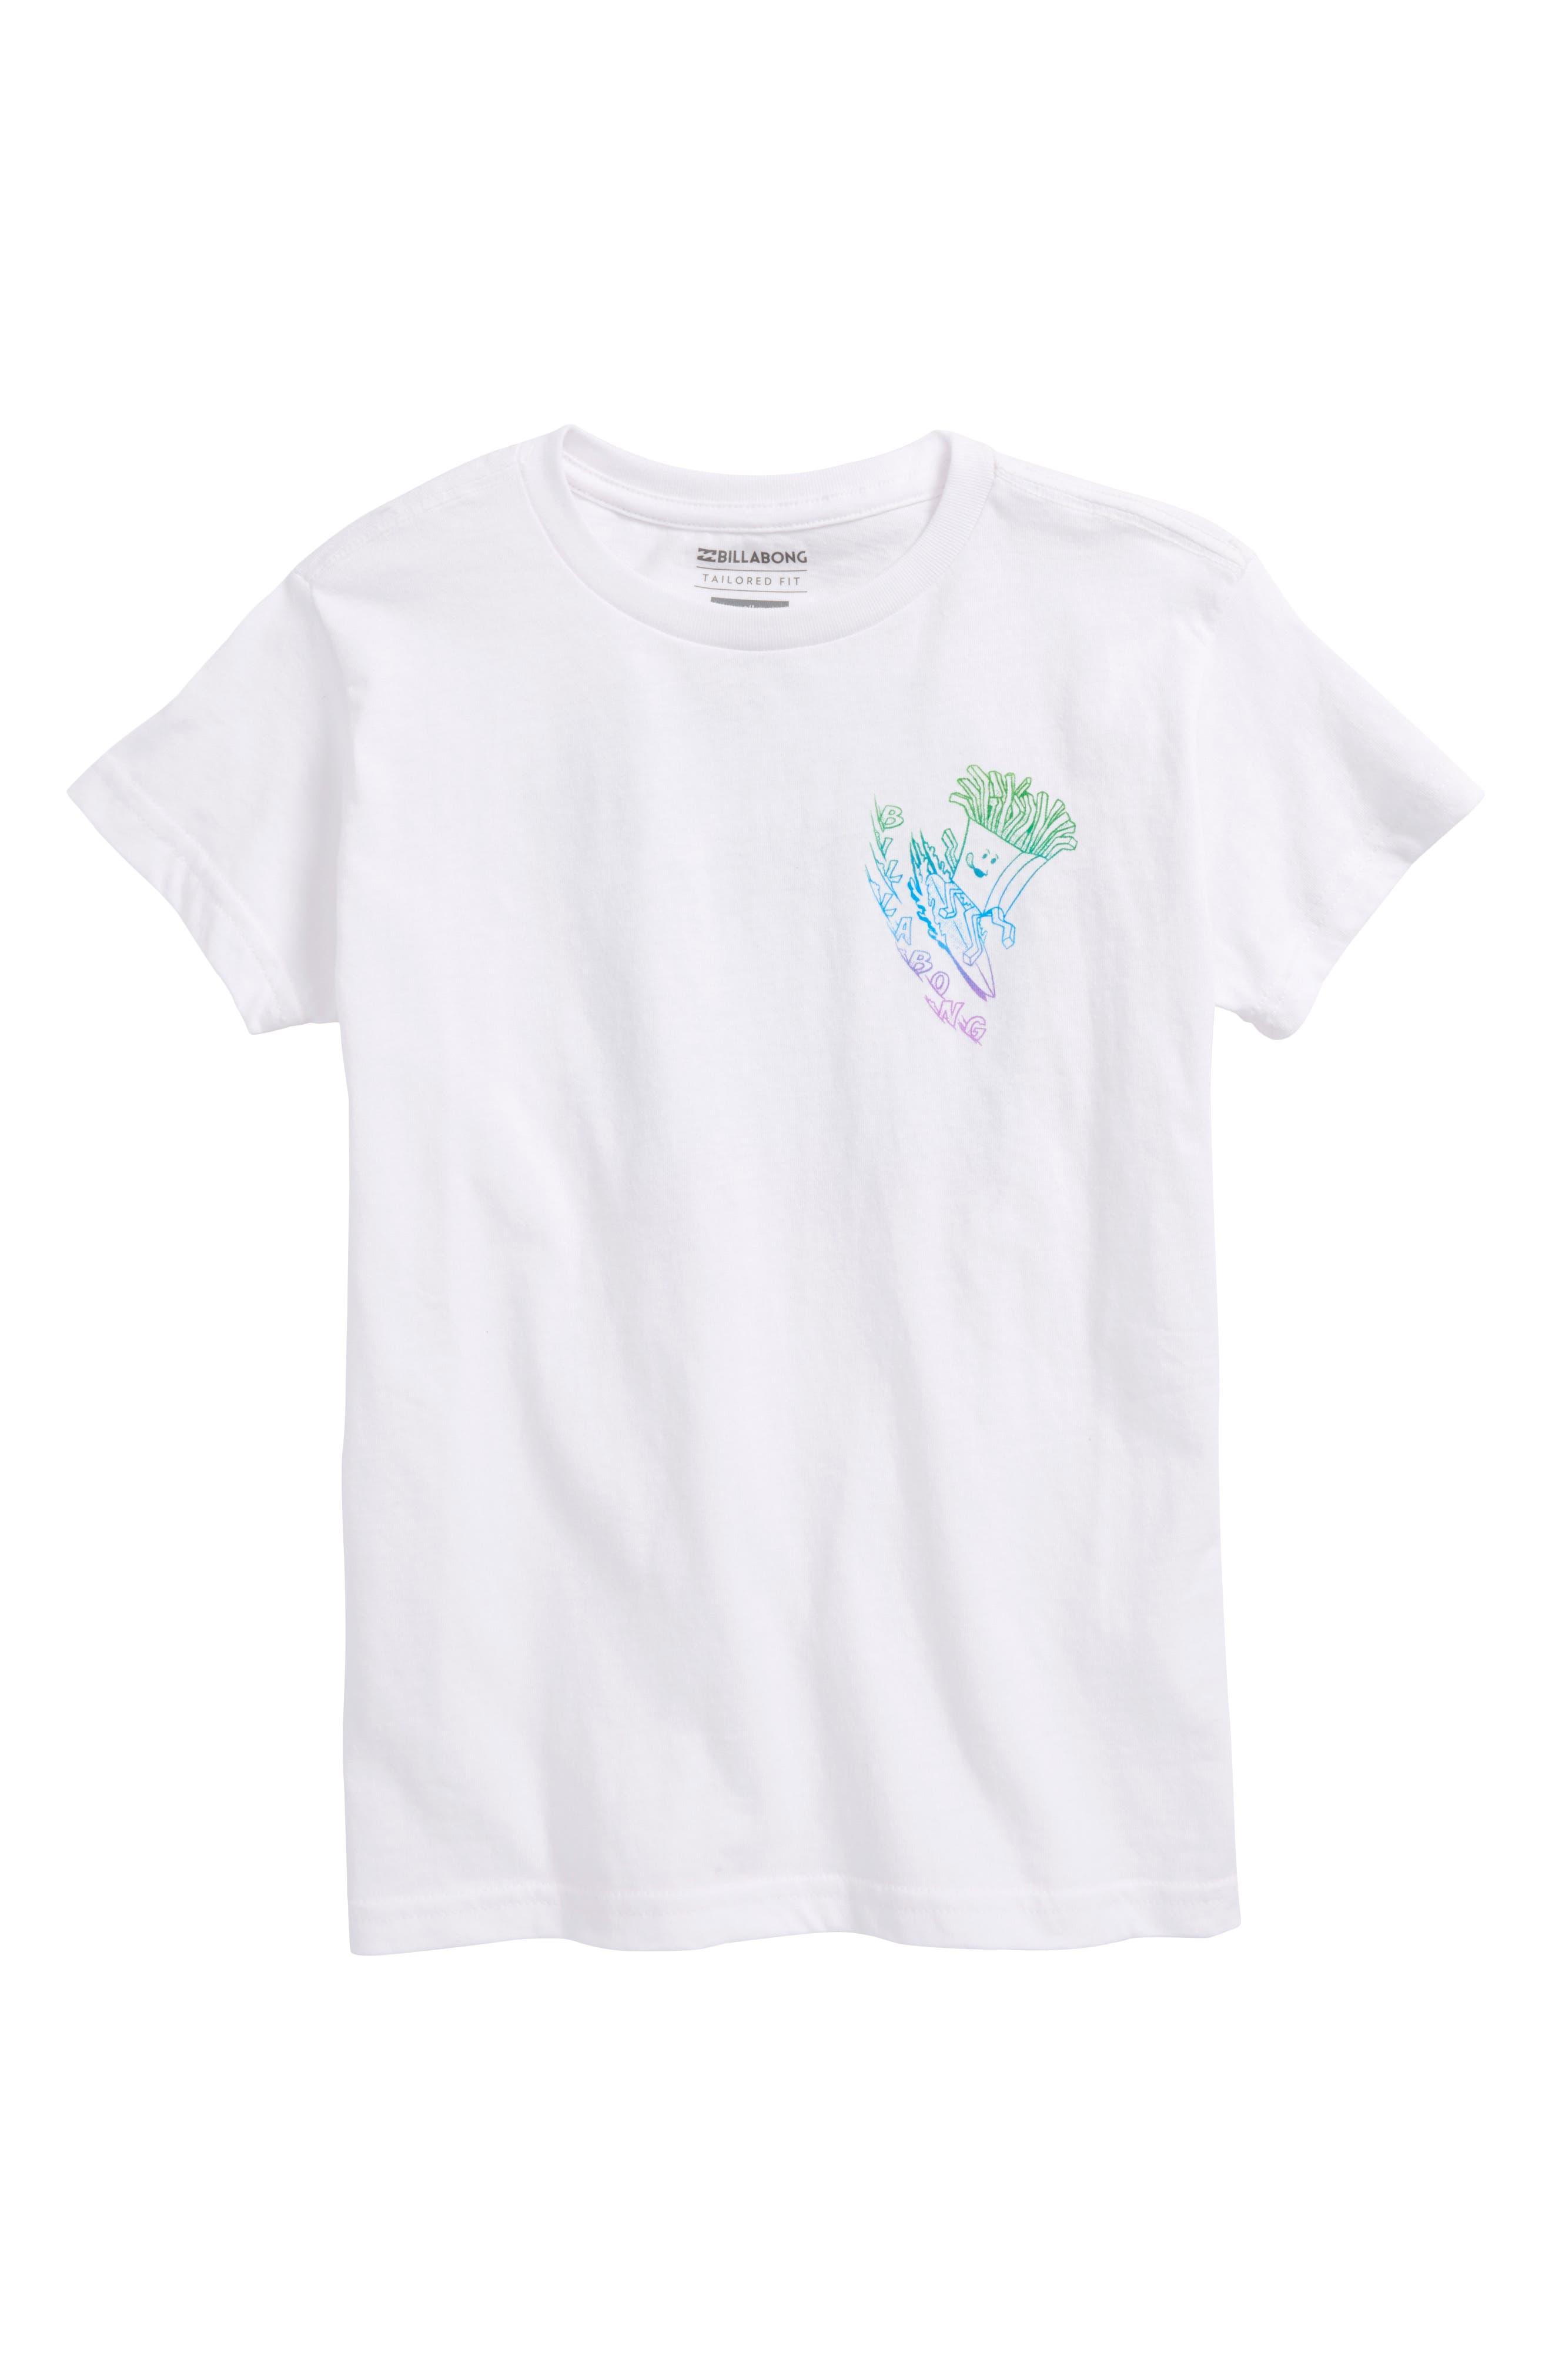 Snacks & Shacks Graphic T-Shirt,                             Main thumbnail 1, color,